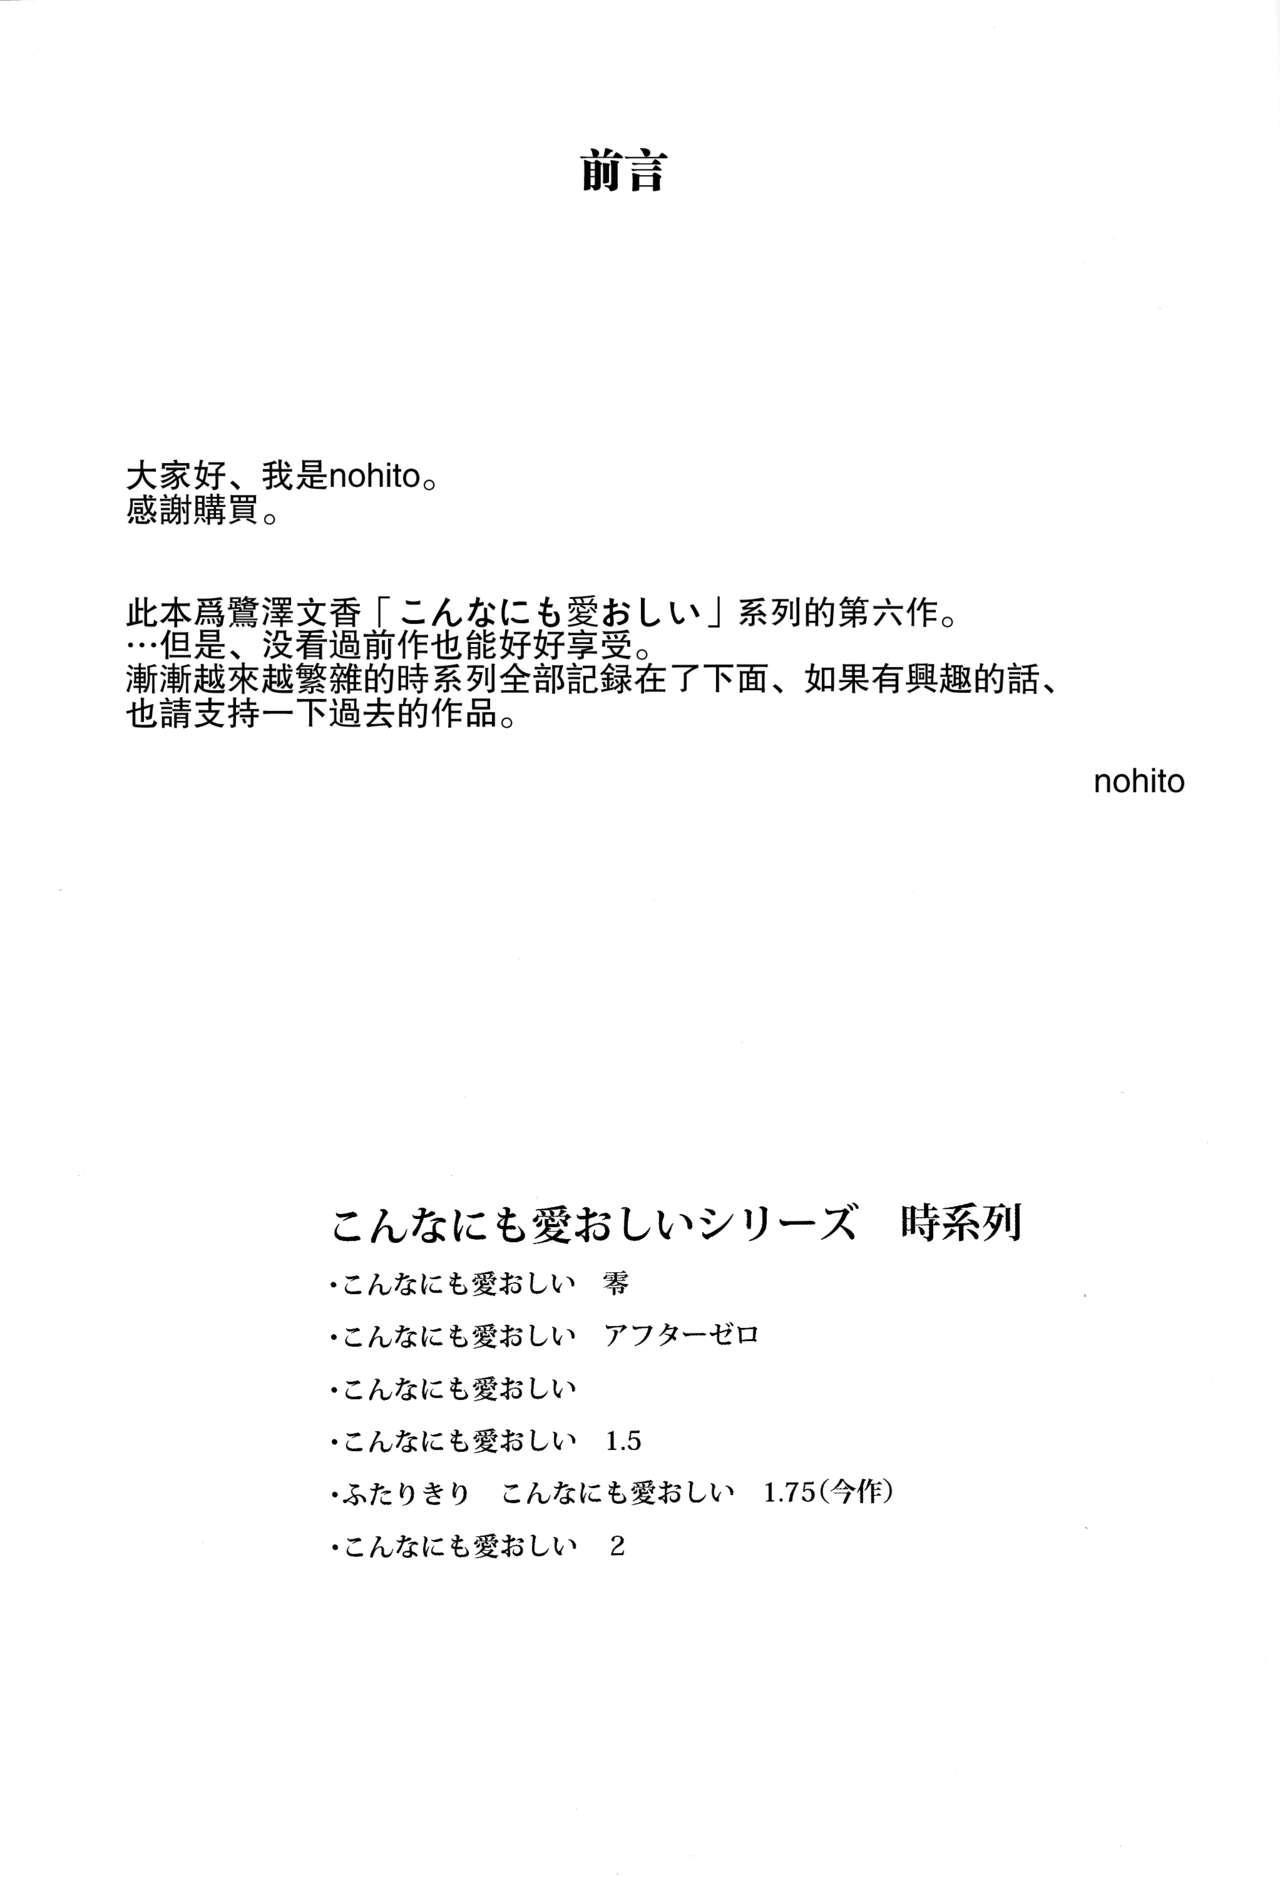 Futarikiri - Konna ni mo Itooshii 1.75 1